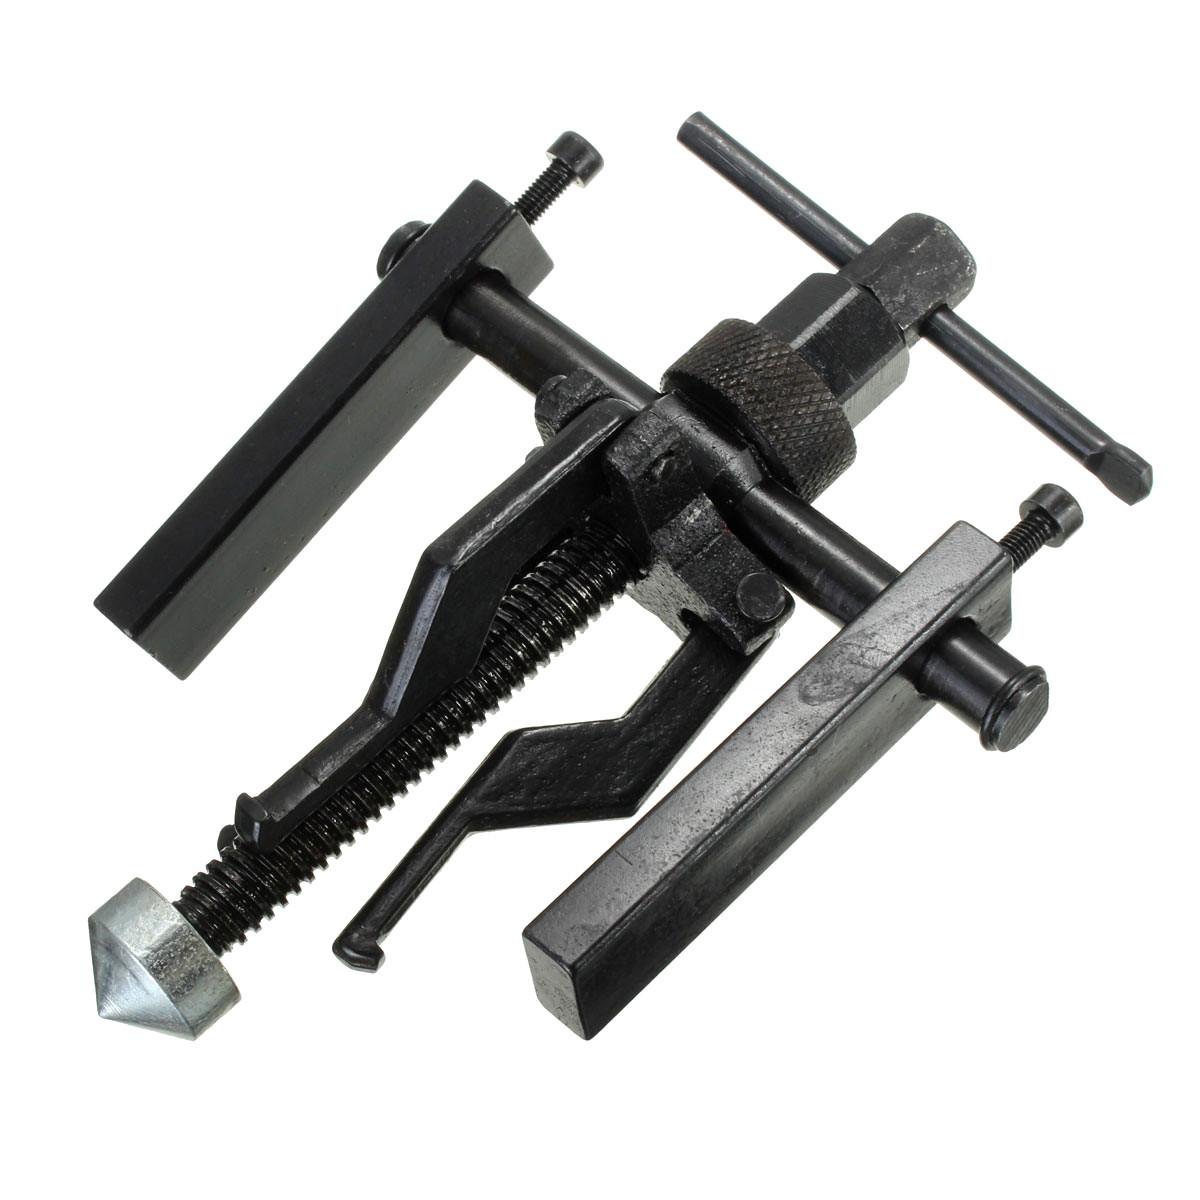 Bearing Puller Parts : Jaw inner bearing puller tooll kit hole